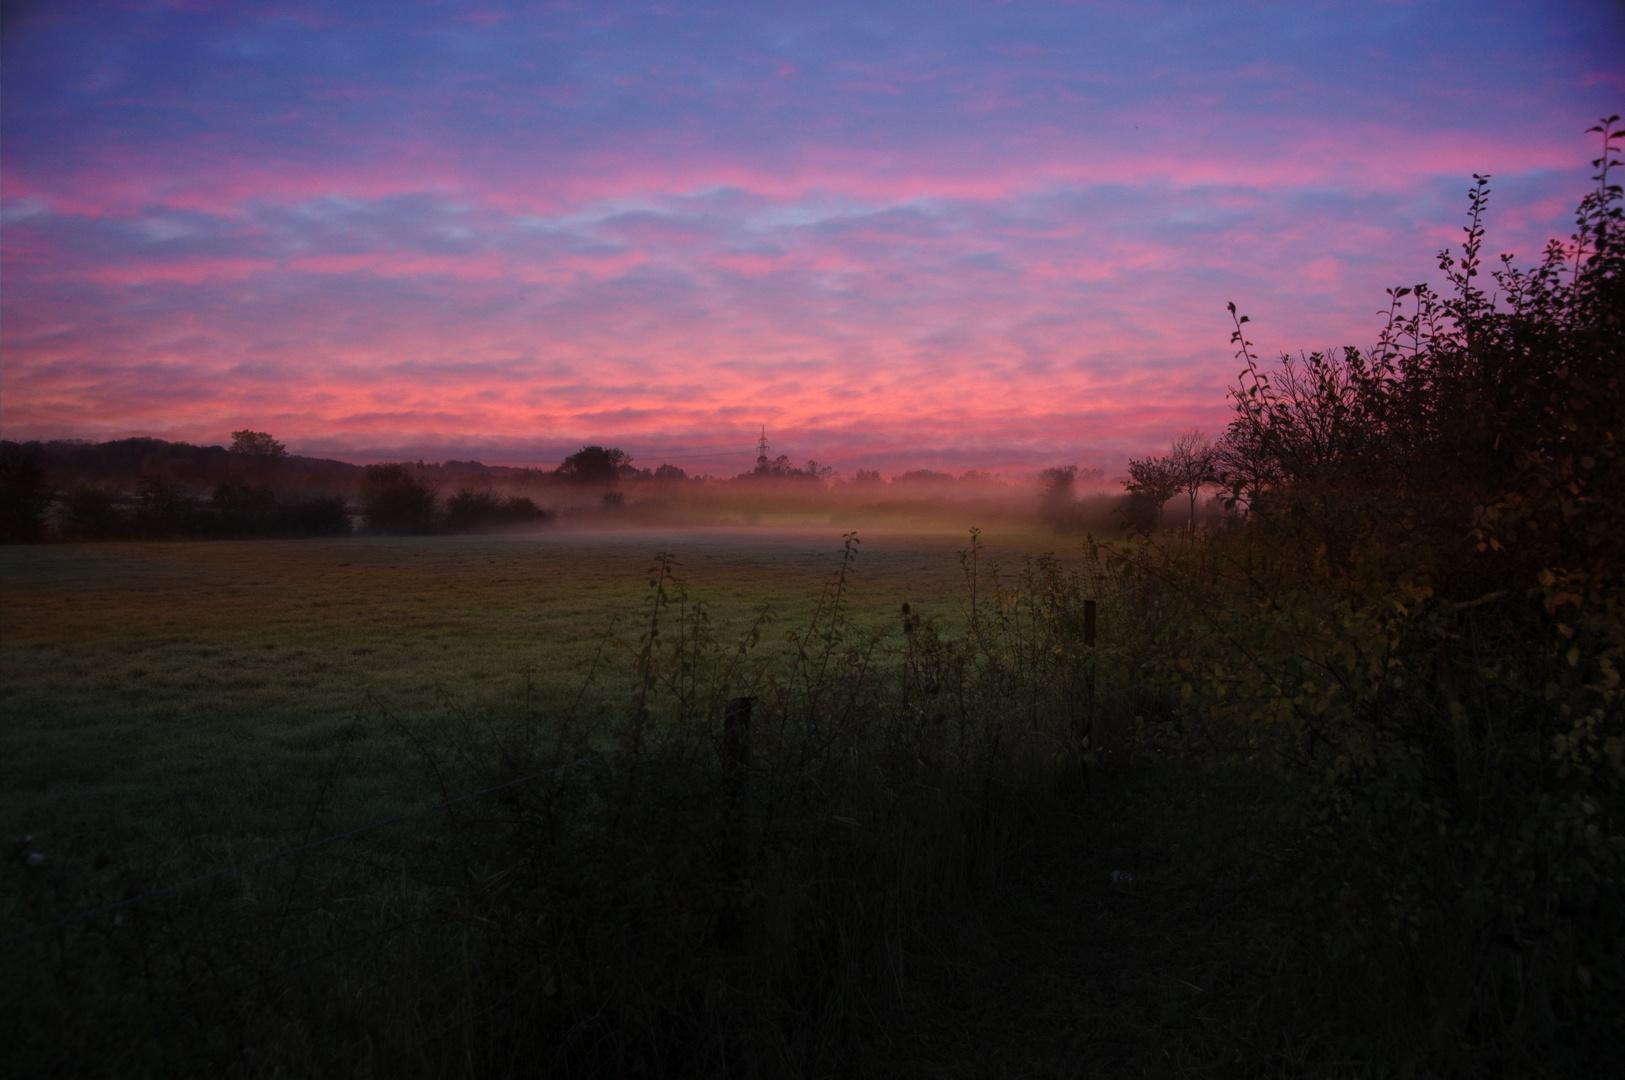 Sonnenuntergang bei Nebel